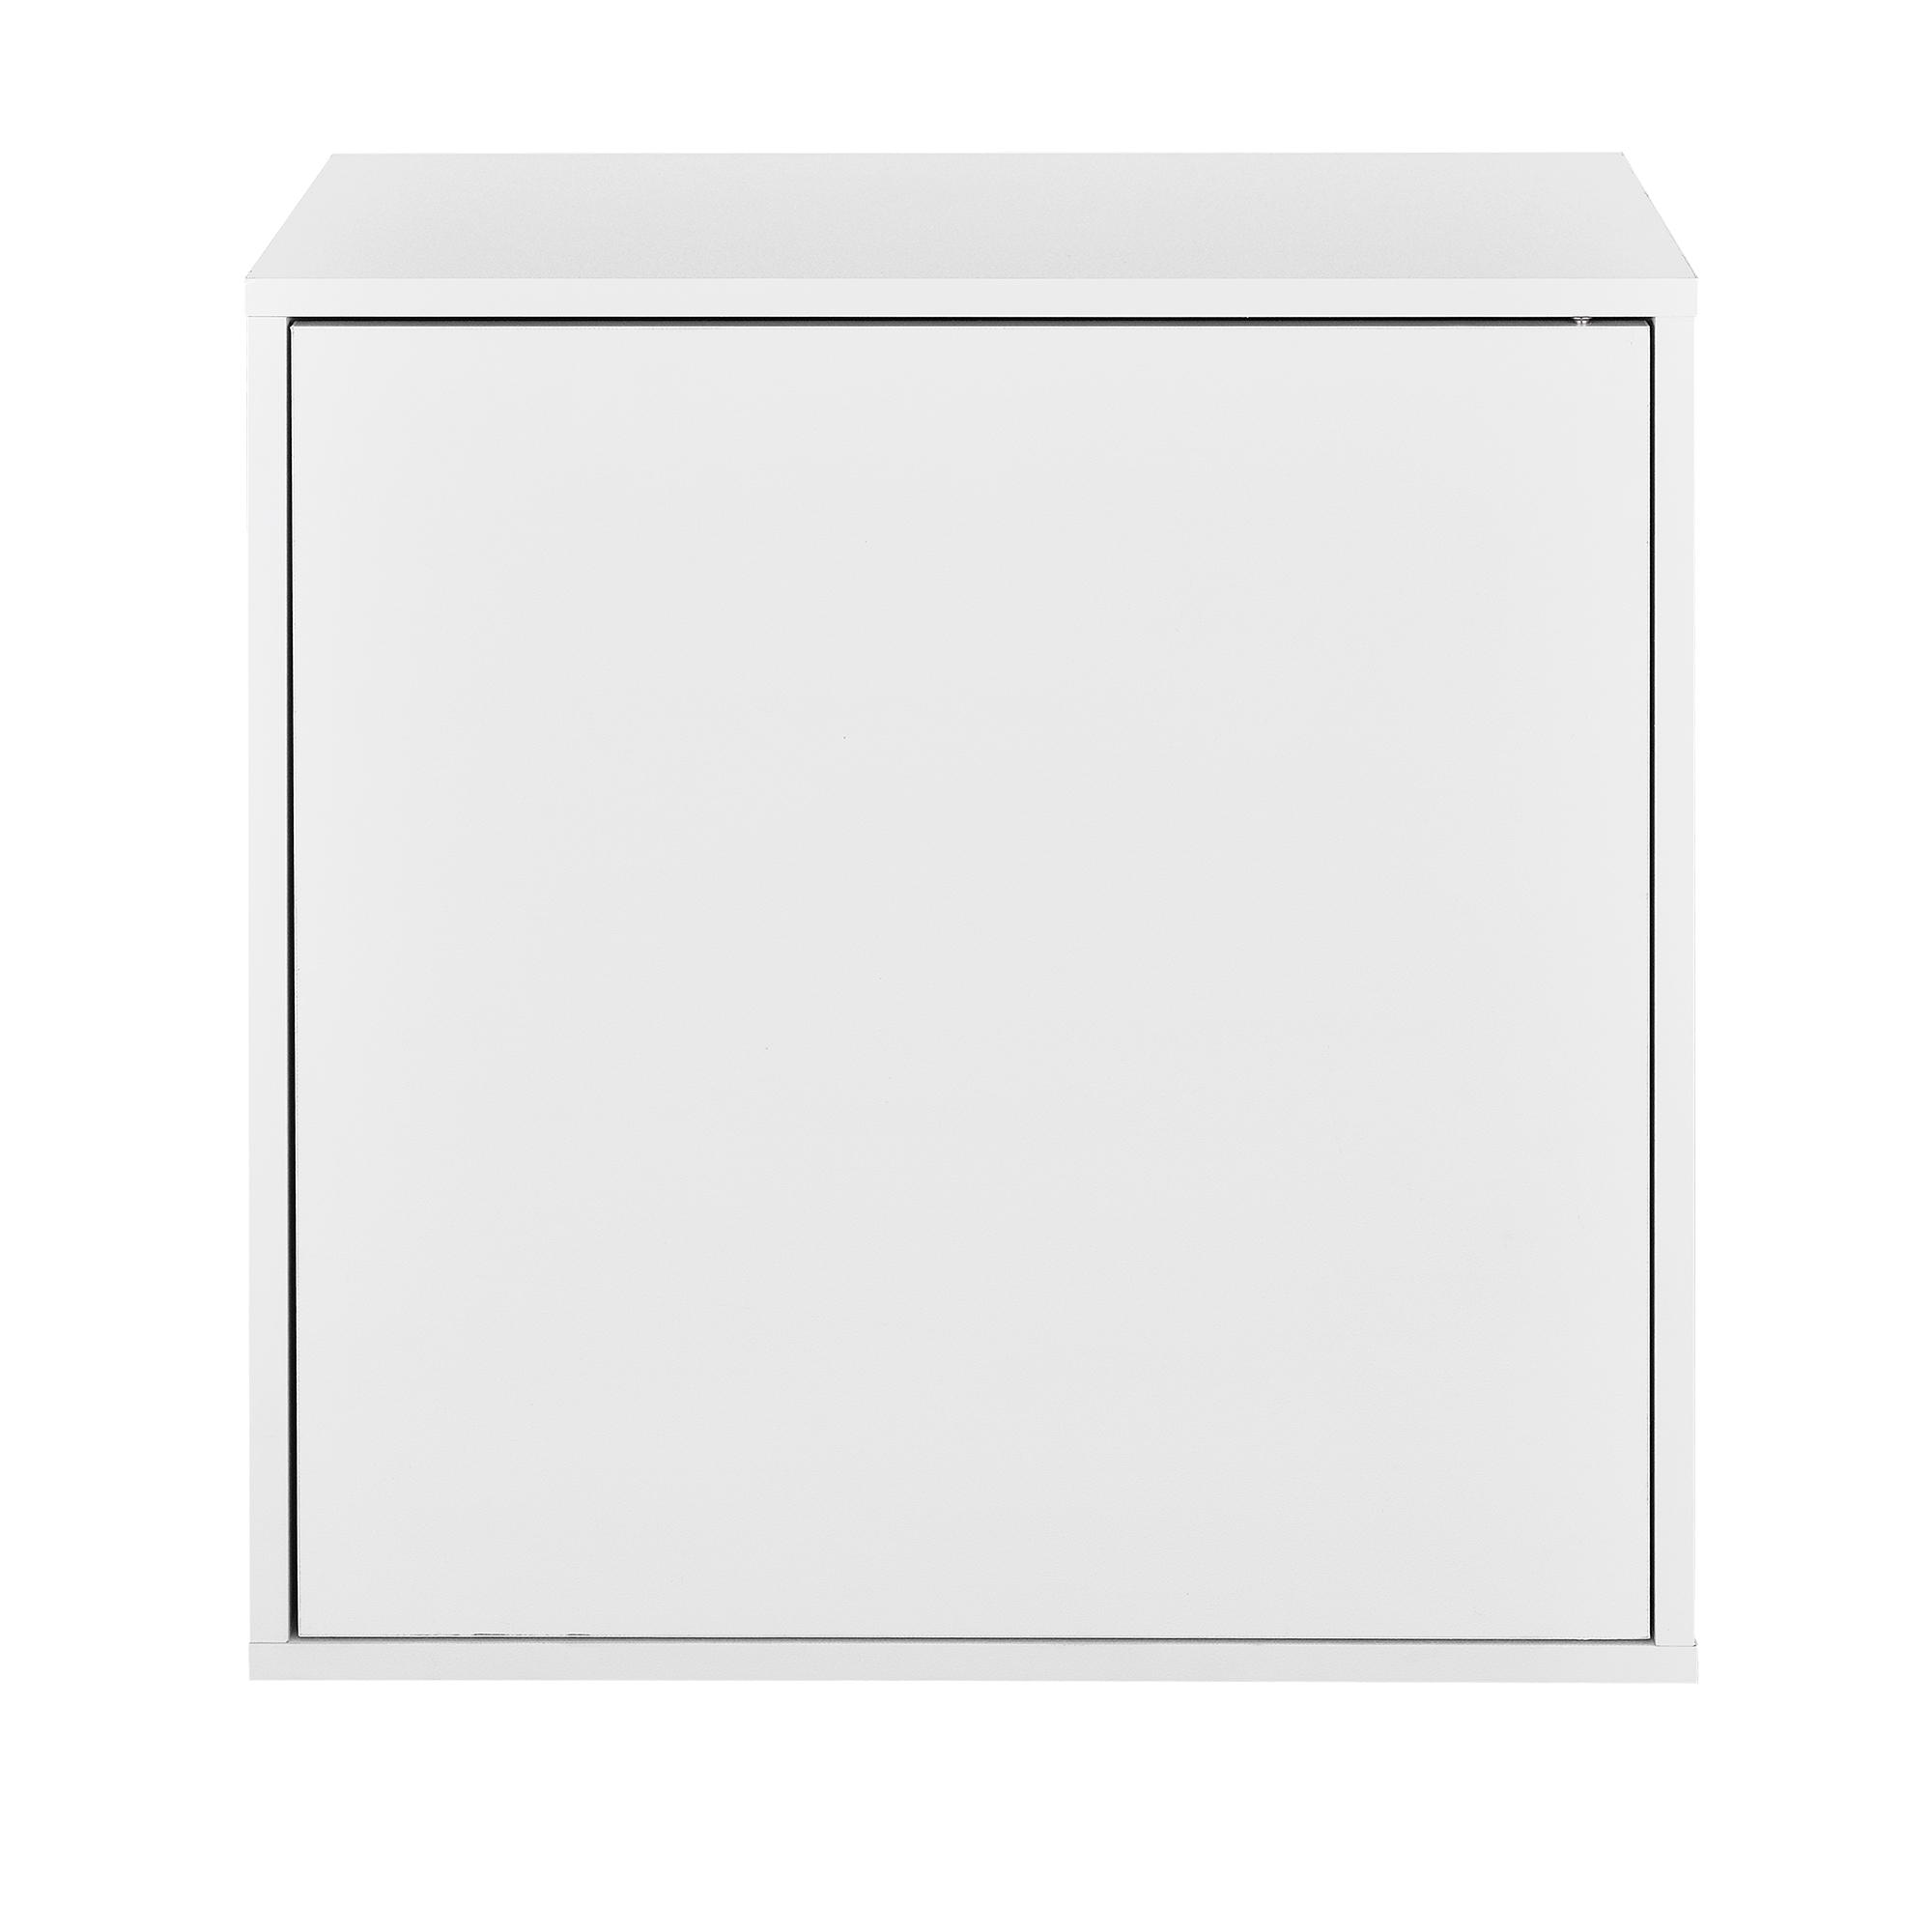 h ngeschrank 45x45x30cm wei wandschrank schrank wandregal regal ebay. Black Bedroom Furniture Sets. Home Design Ideas